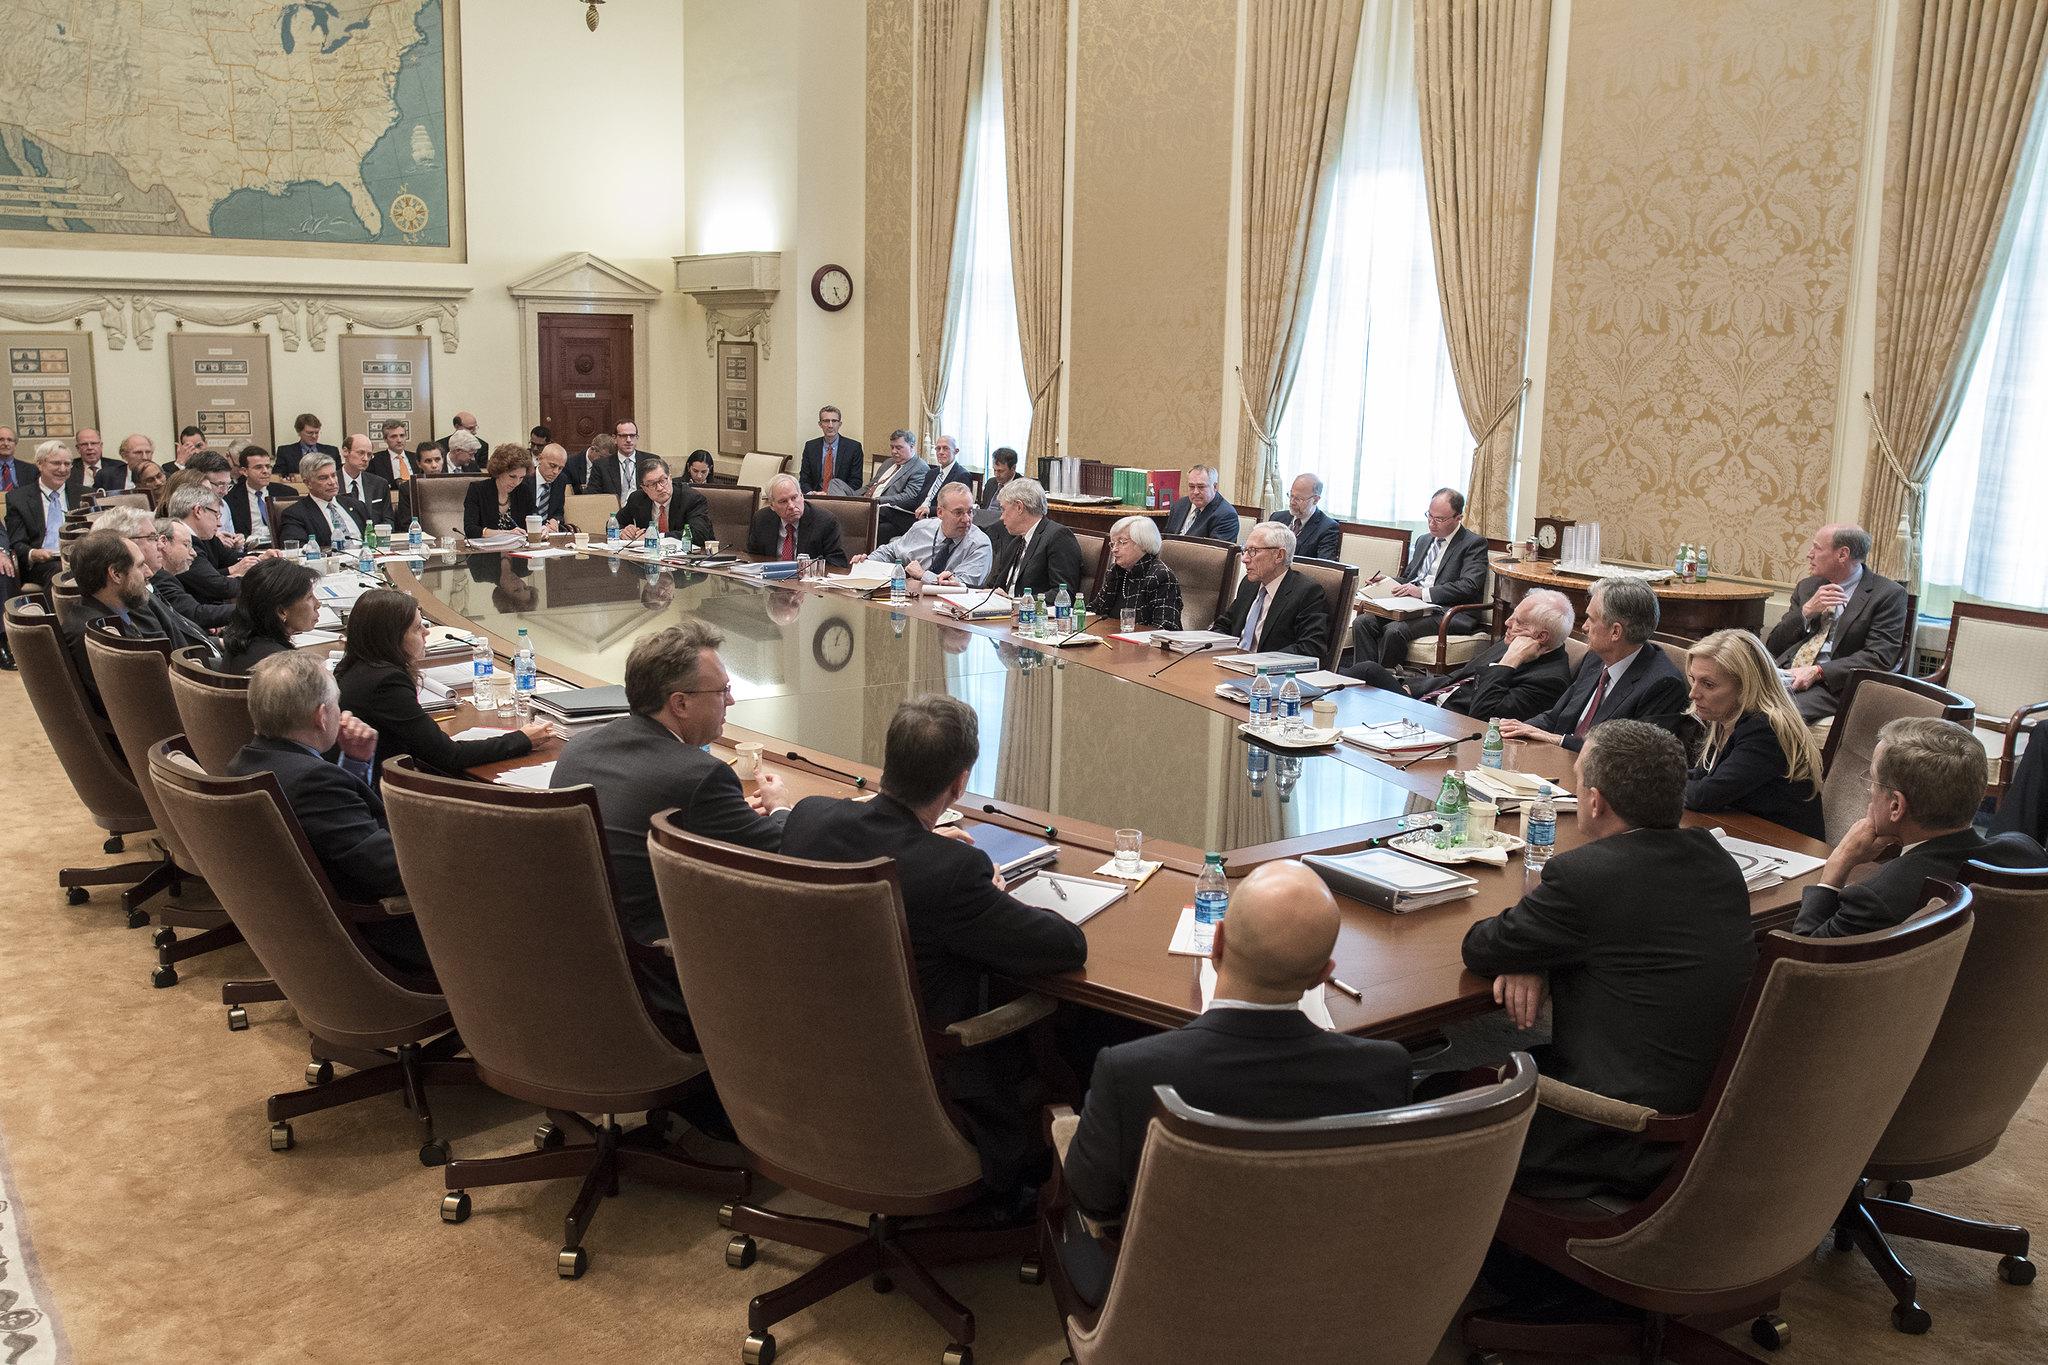 Federal Open Market Committee (FOMC) Meeting: FOMC_042616_00071